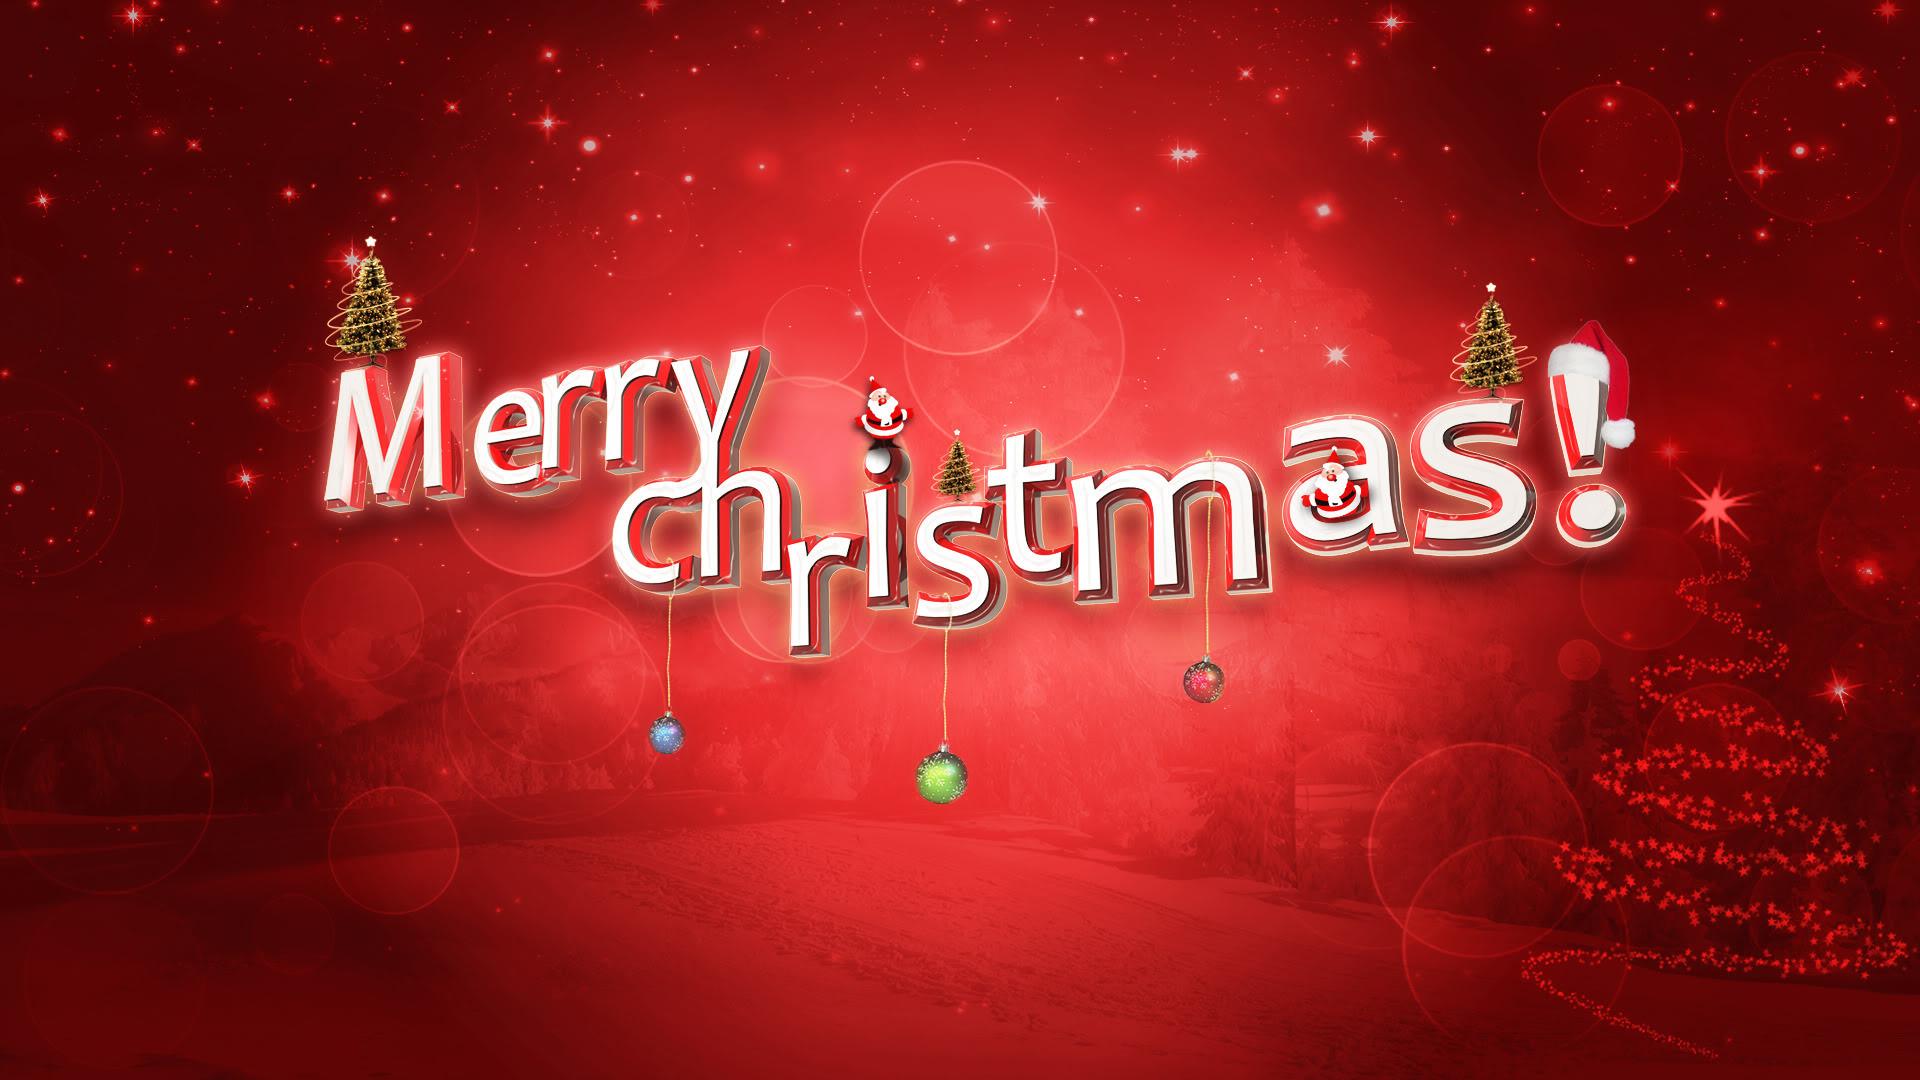 Desktop Merry Christmas HD Wallpapers Free Download.